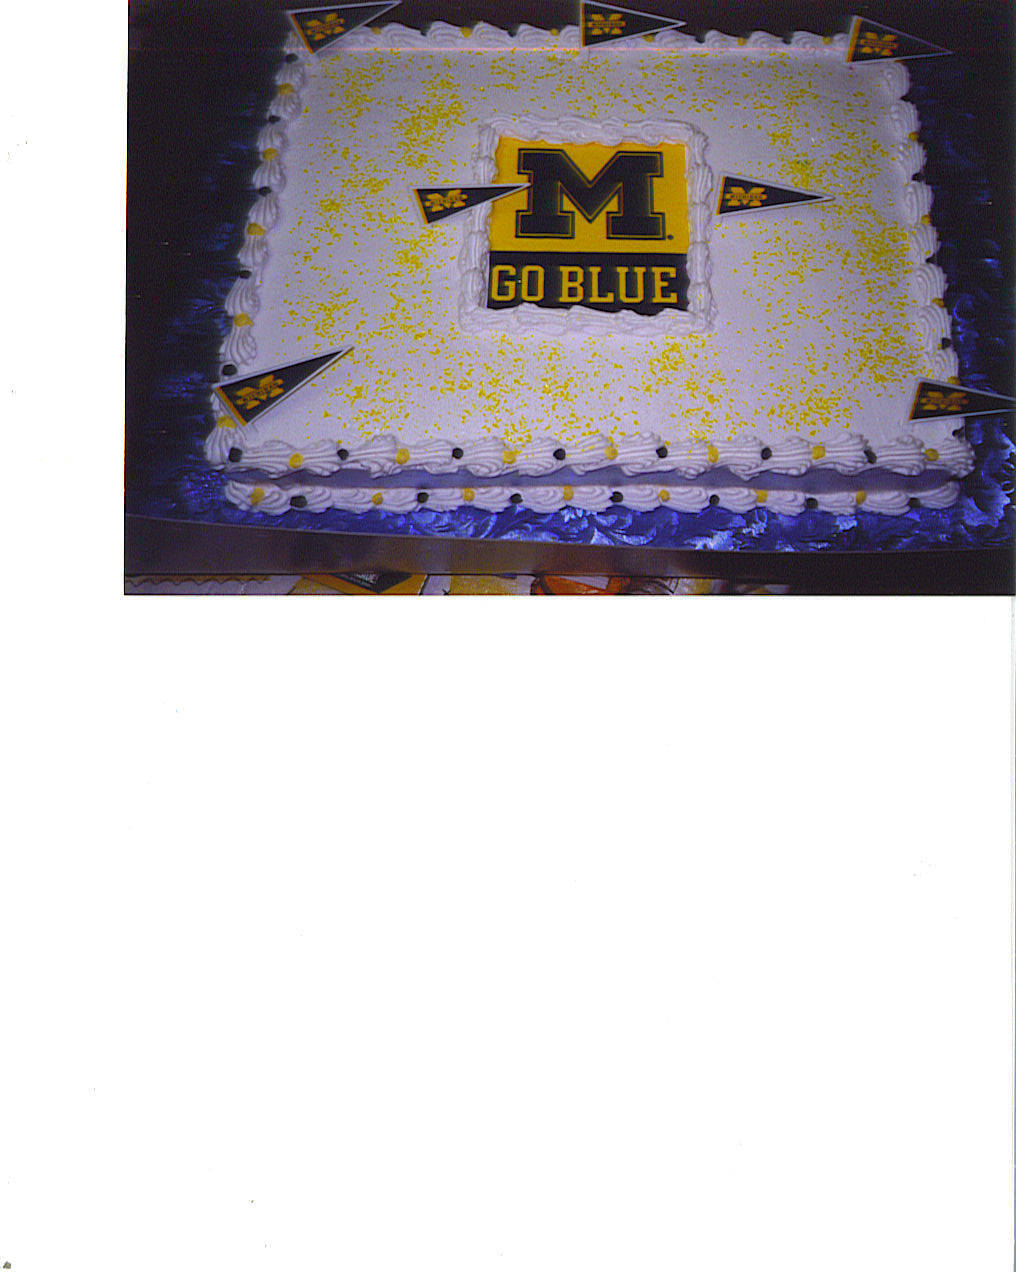 Connie's Celebrations image 1